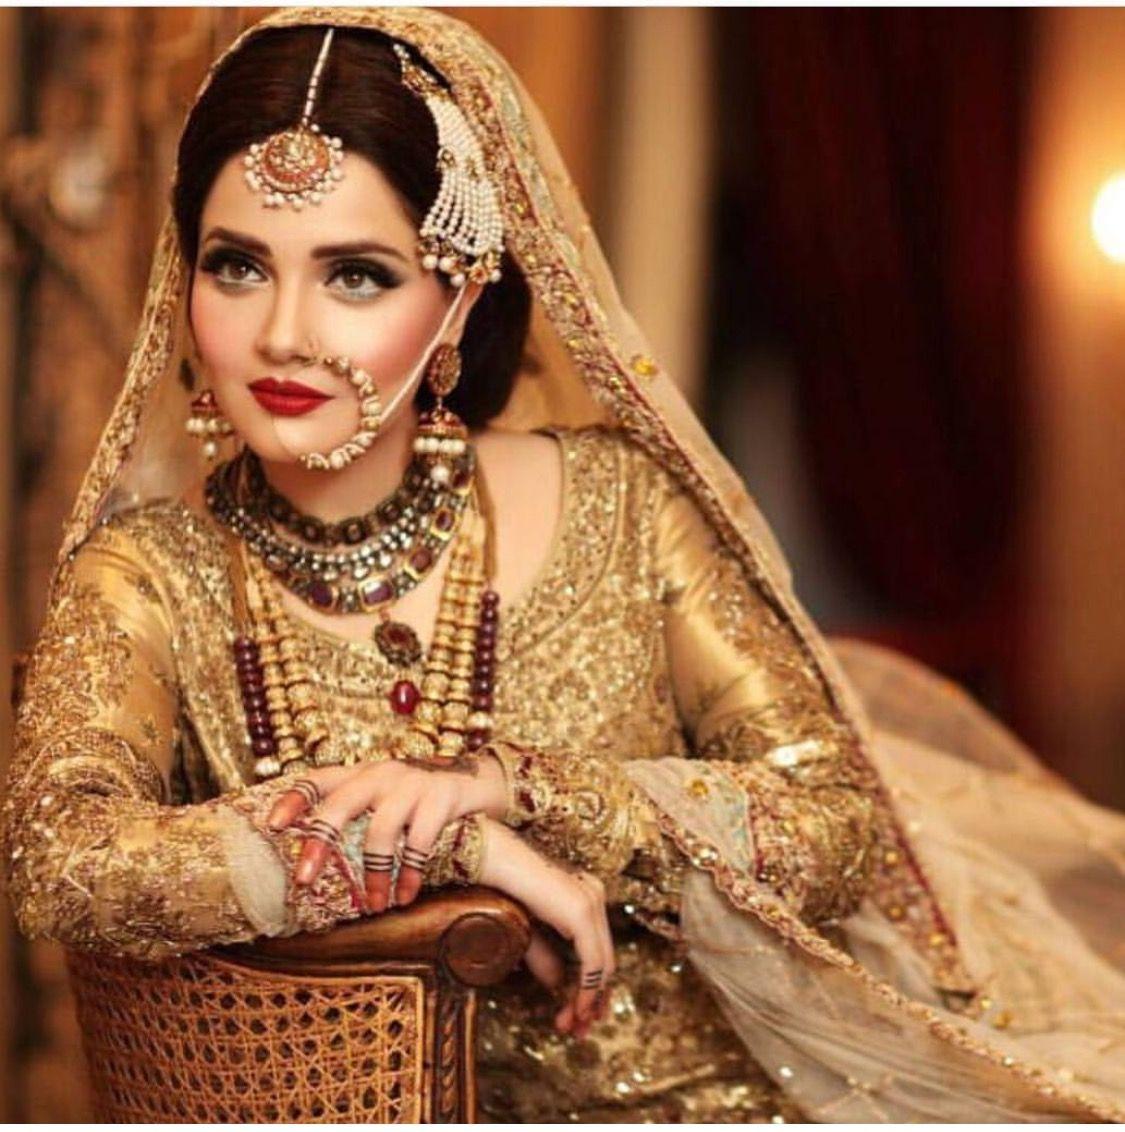 pakistani bride | kundan gold | libas in 2019 | pakistani